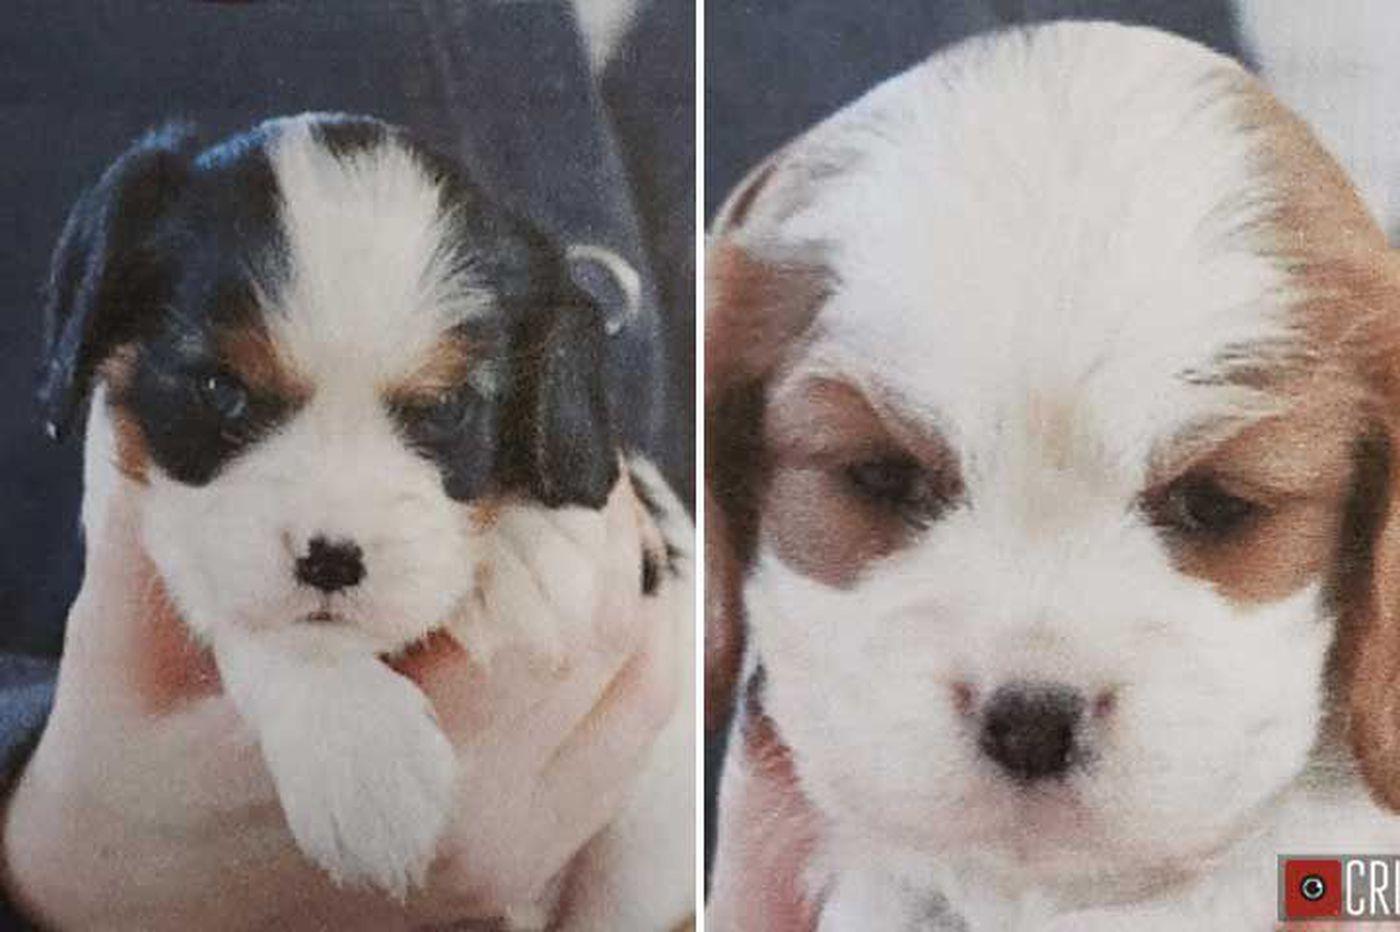 Bucks County breeder 'worried sick' after 7-week old puppies are stolen